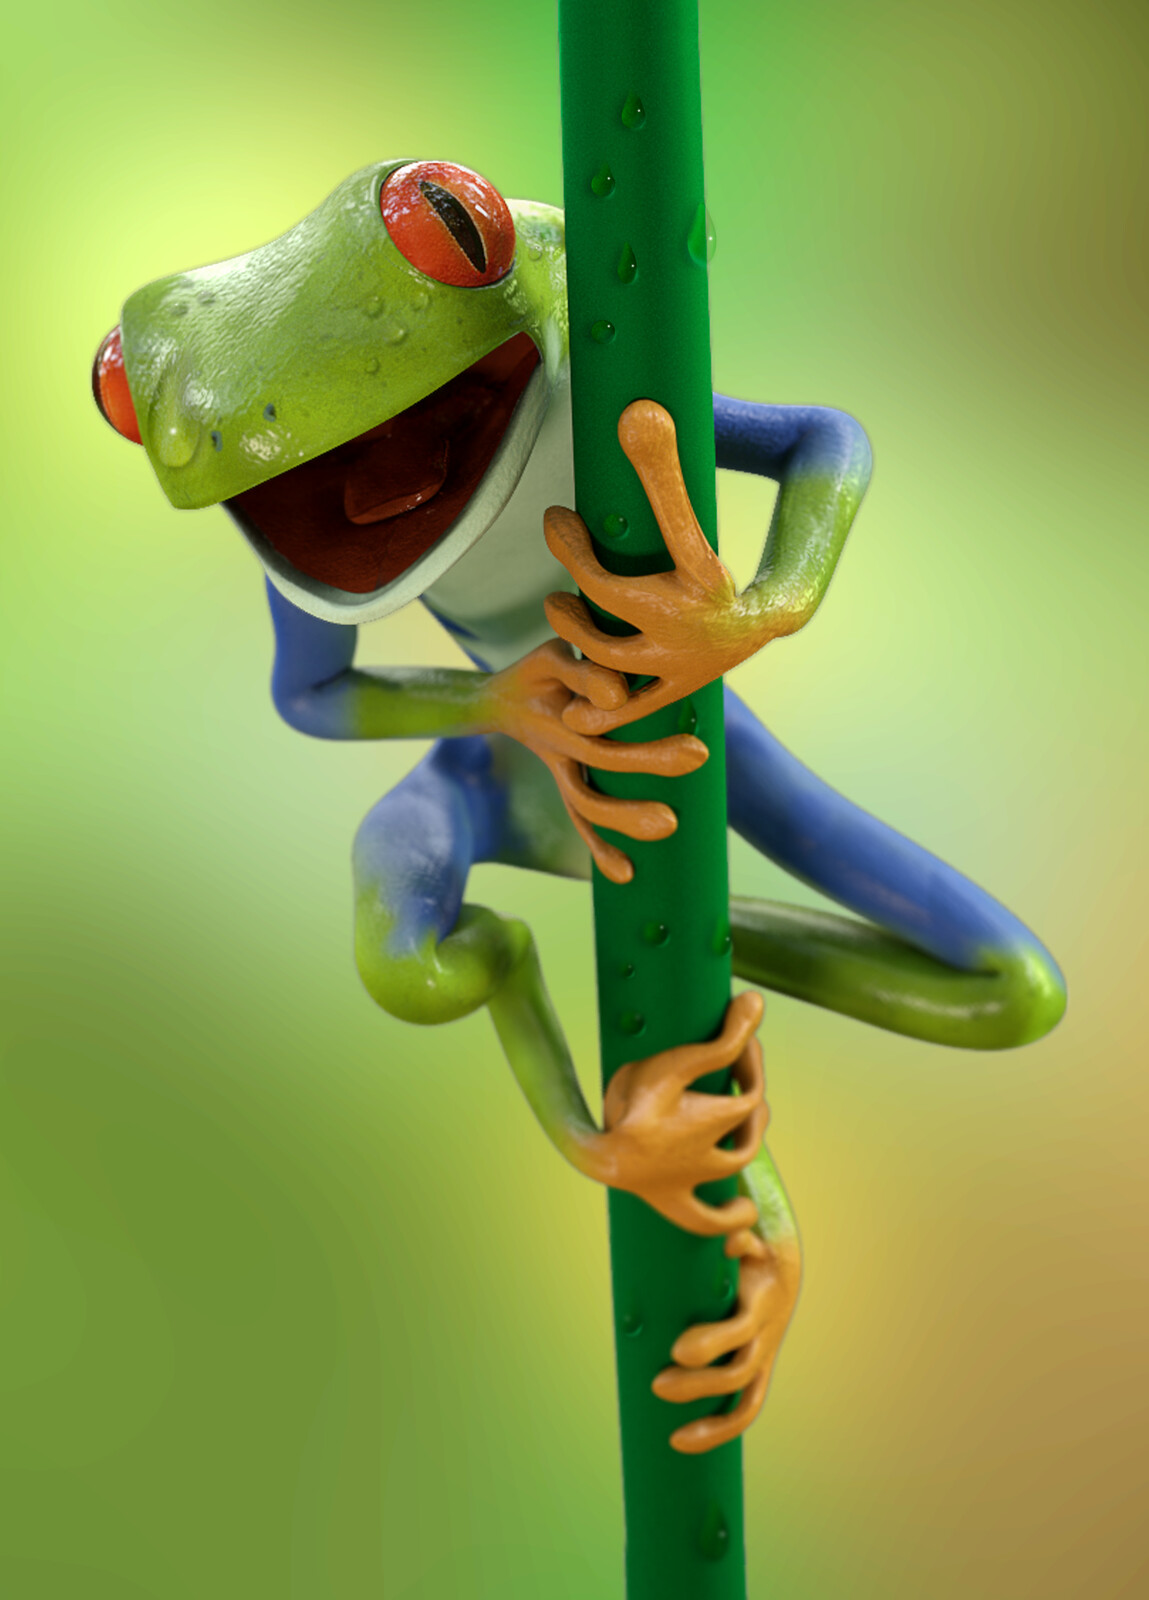 Red eyed tree Froggo